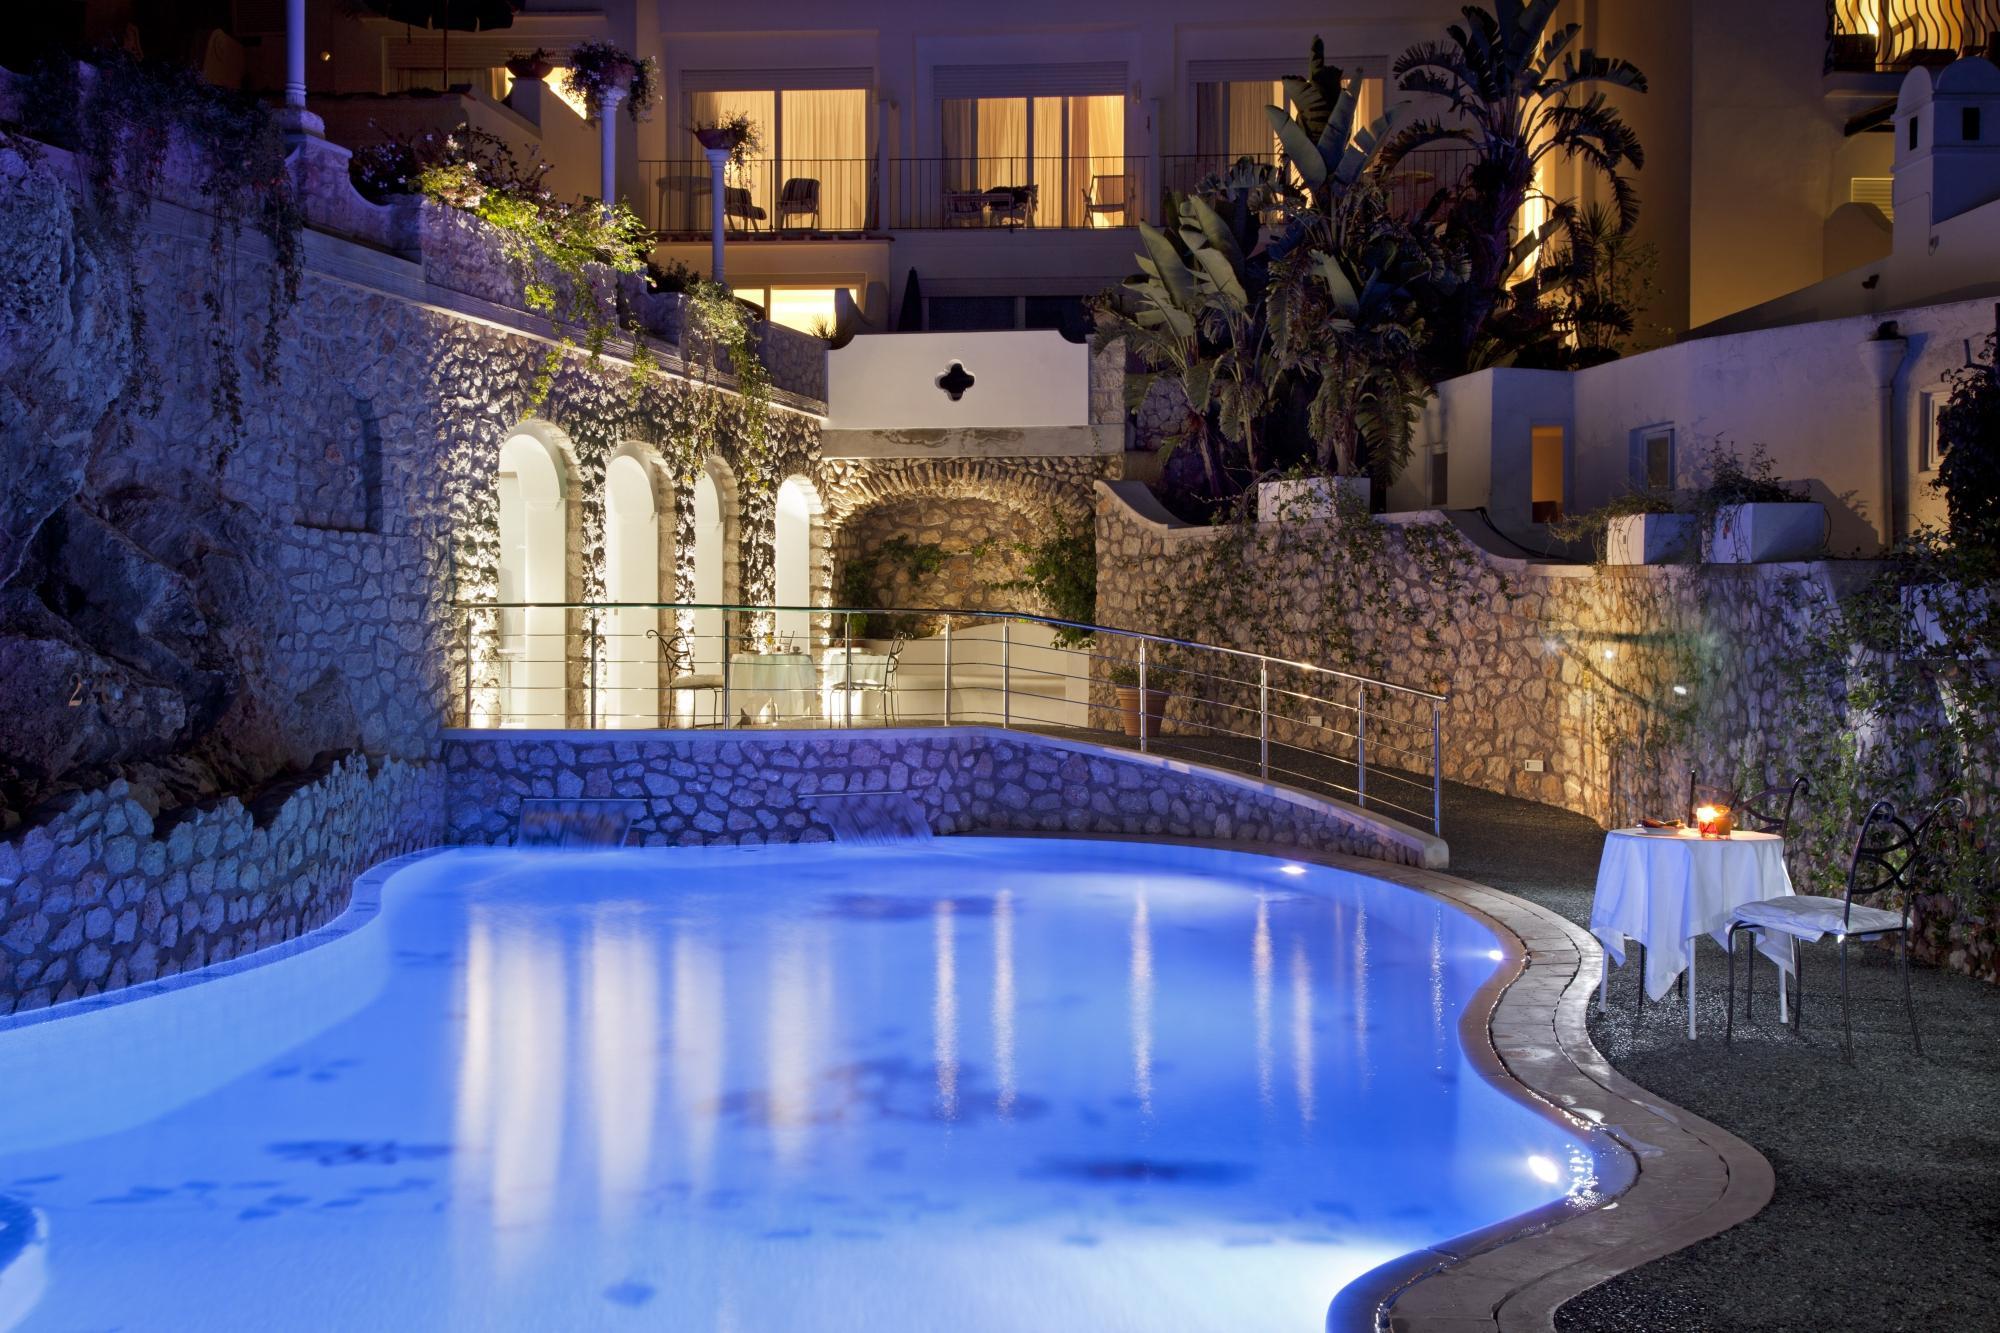 Hotel La Floridiana